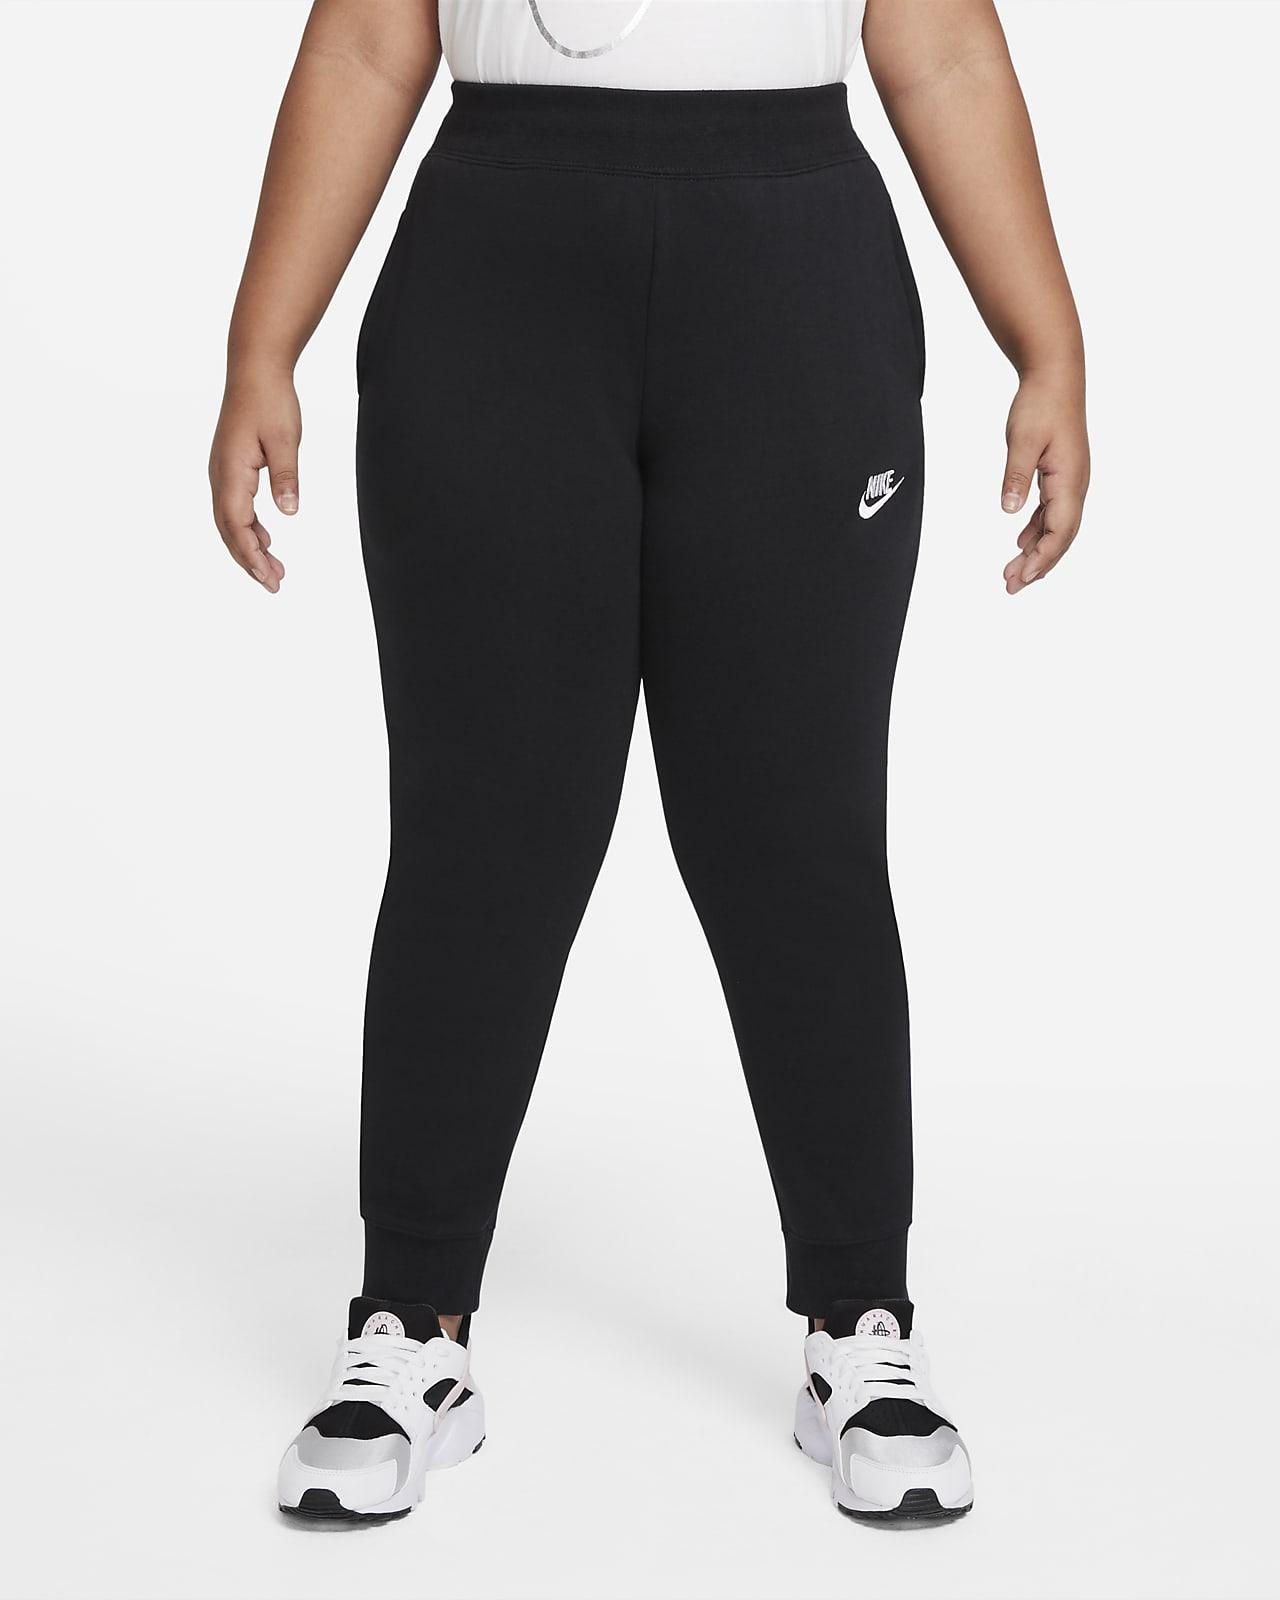 Pantalon Nike Sportswear Club Fleece pour Fille plus âgée (taille étendue)